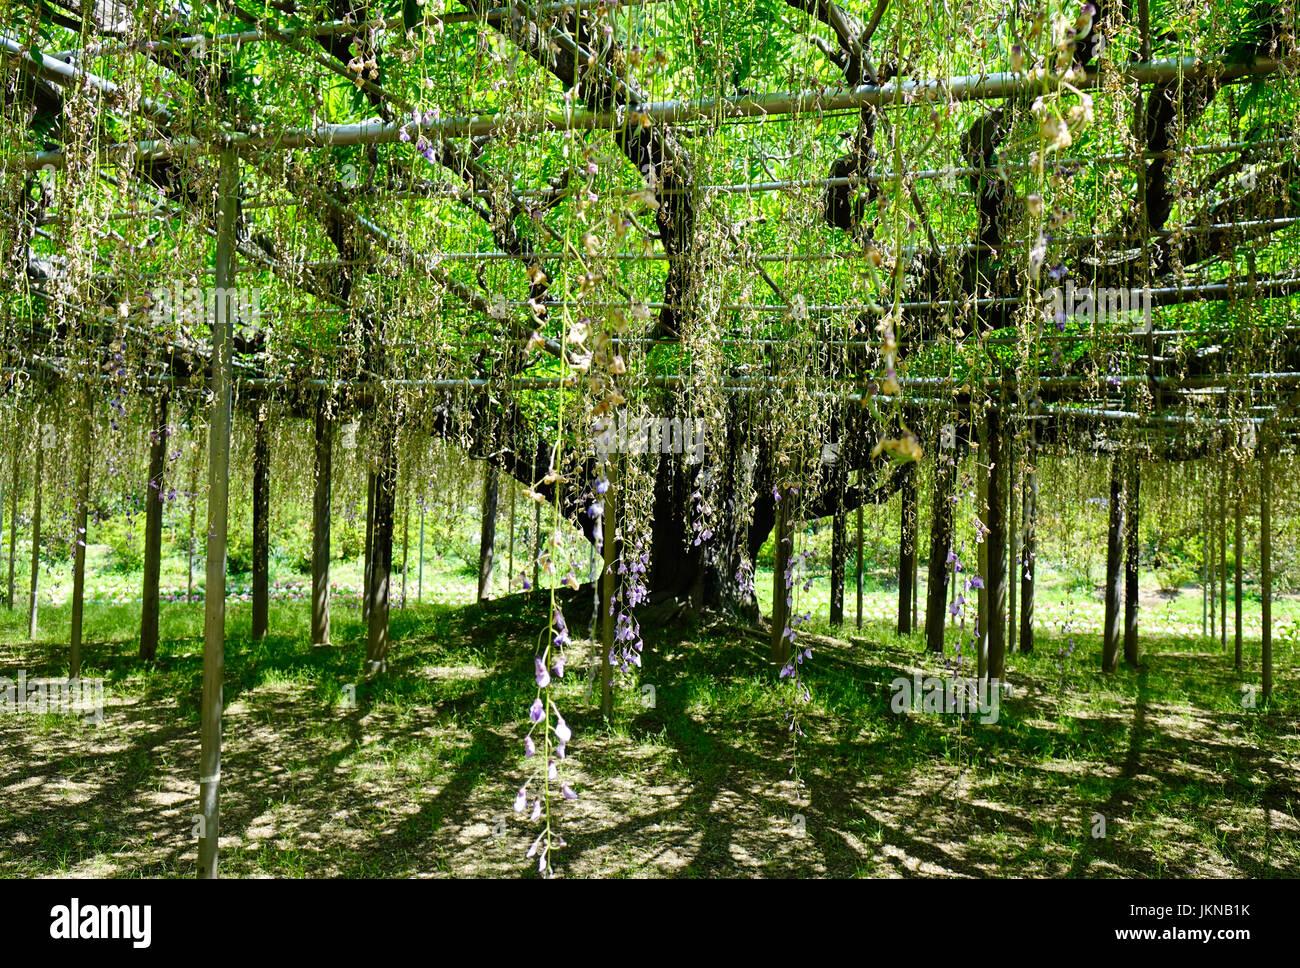 Wisteria tree at Ashikaga Flower Park in sunny day. The park located in Ashikaga City, Tochigi Prefecture, Japan. - Stock Image